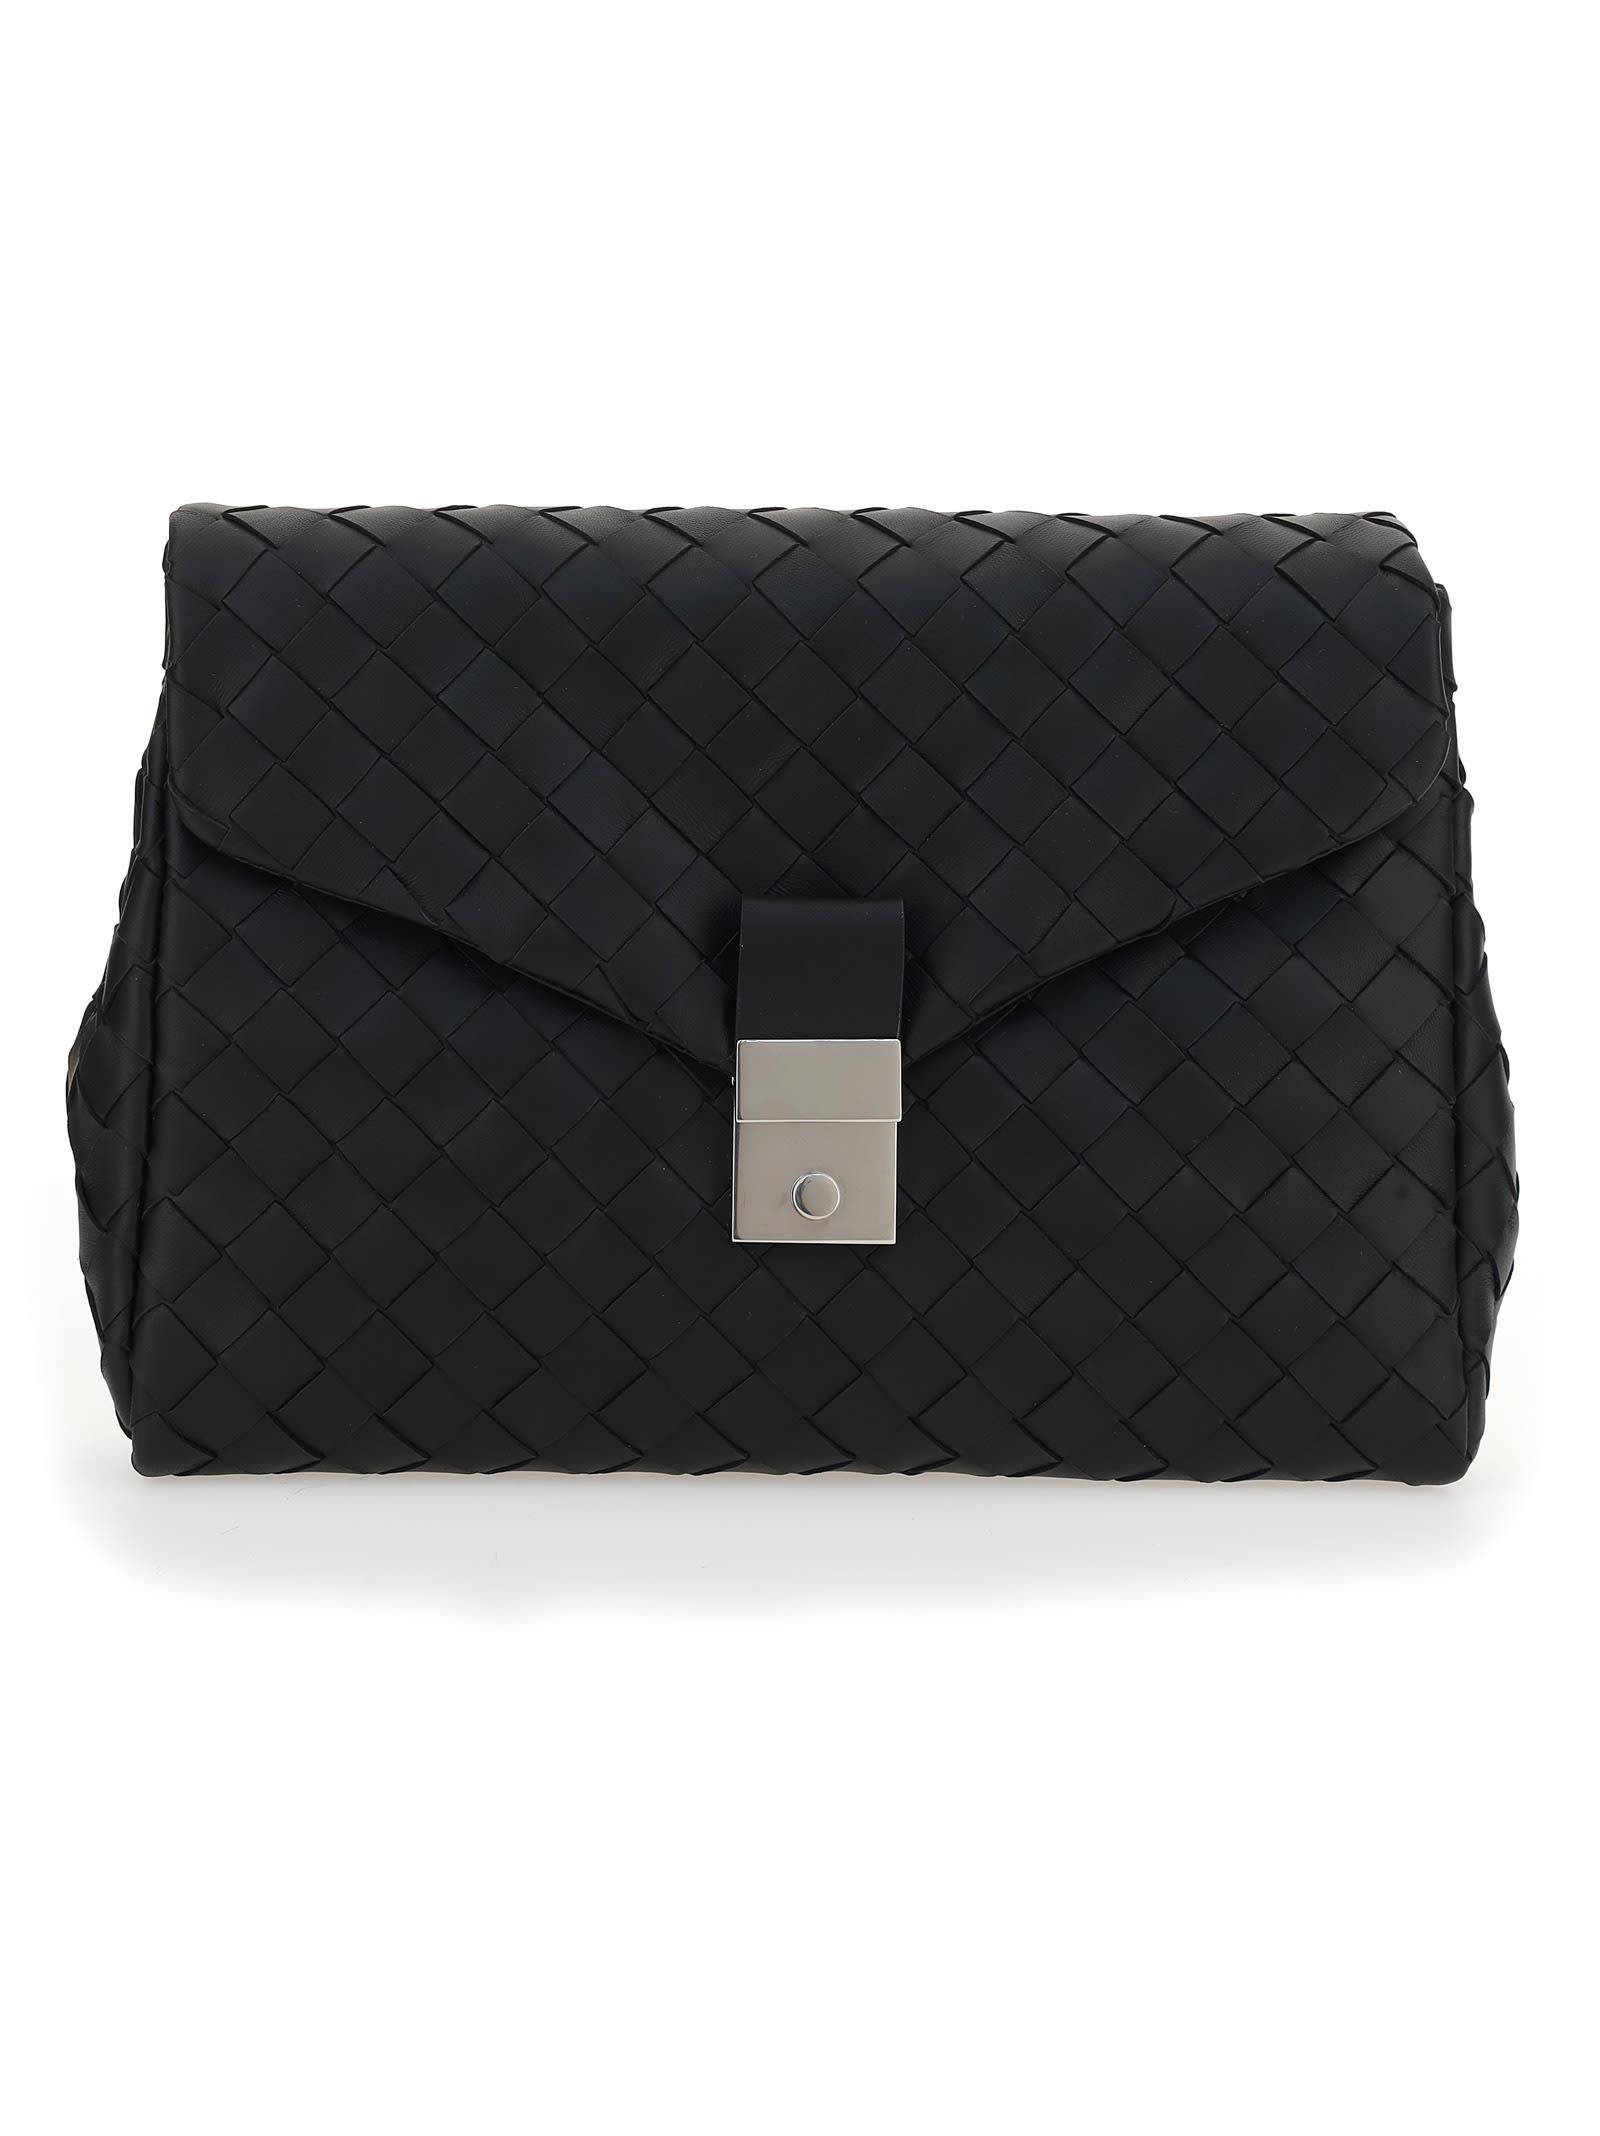 Bottega Veneta Small Briefcase